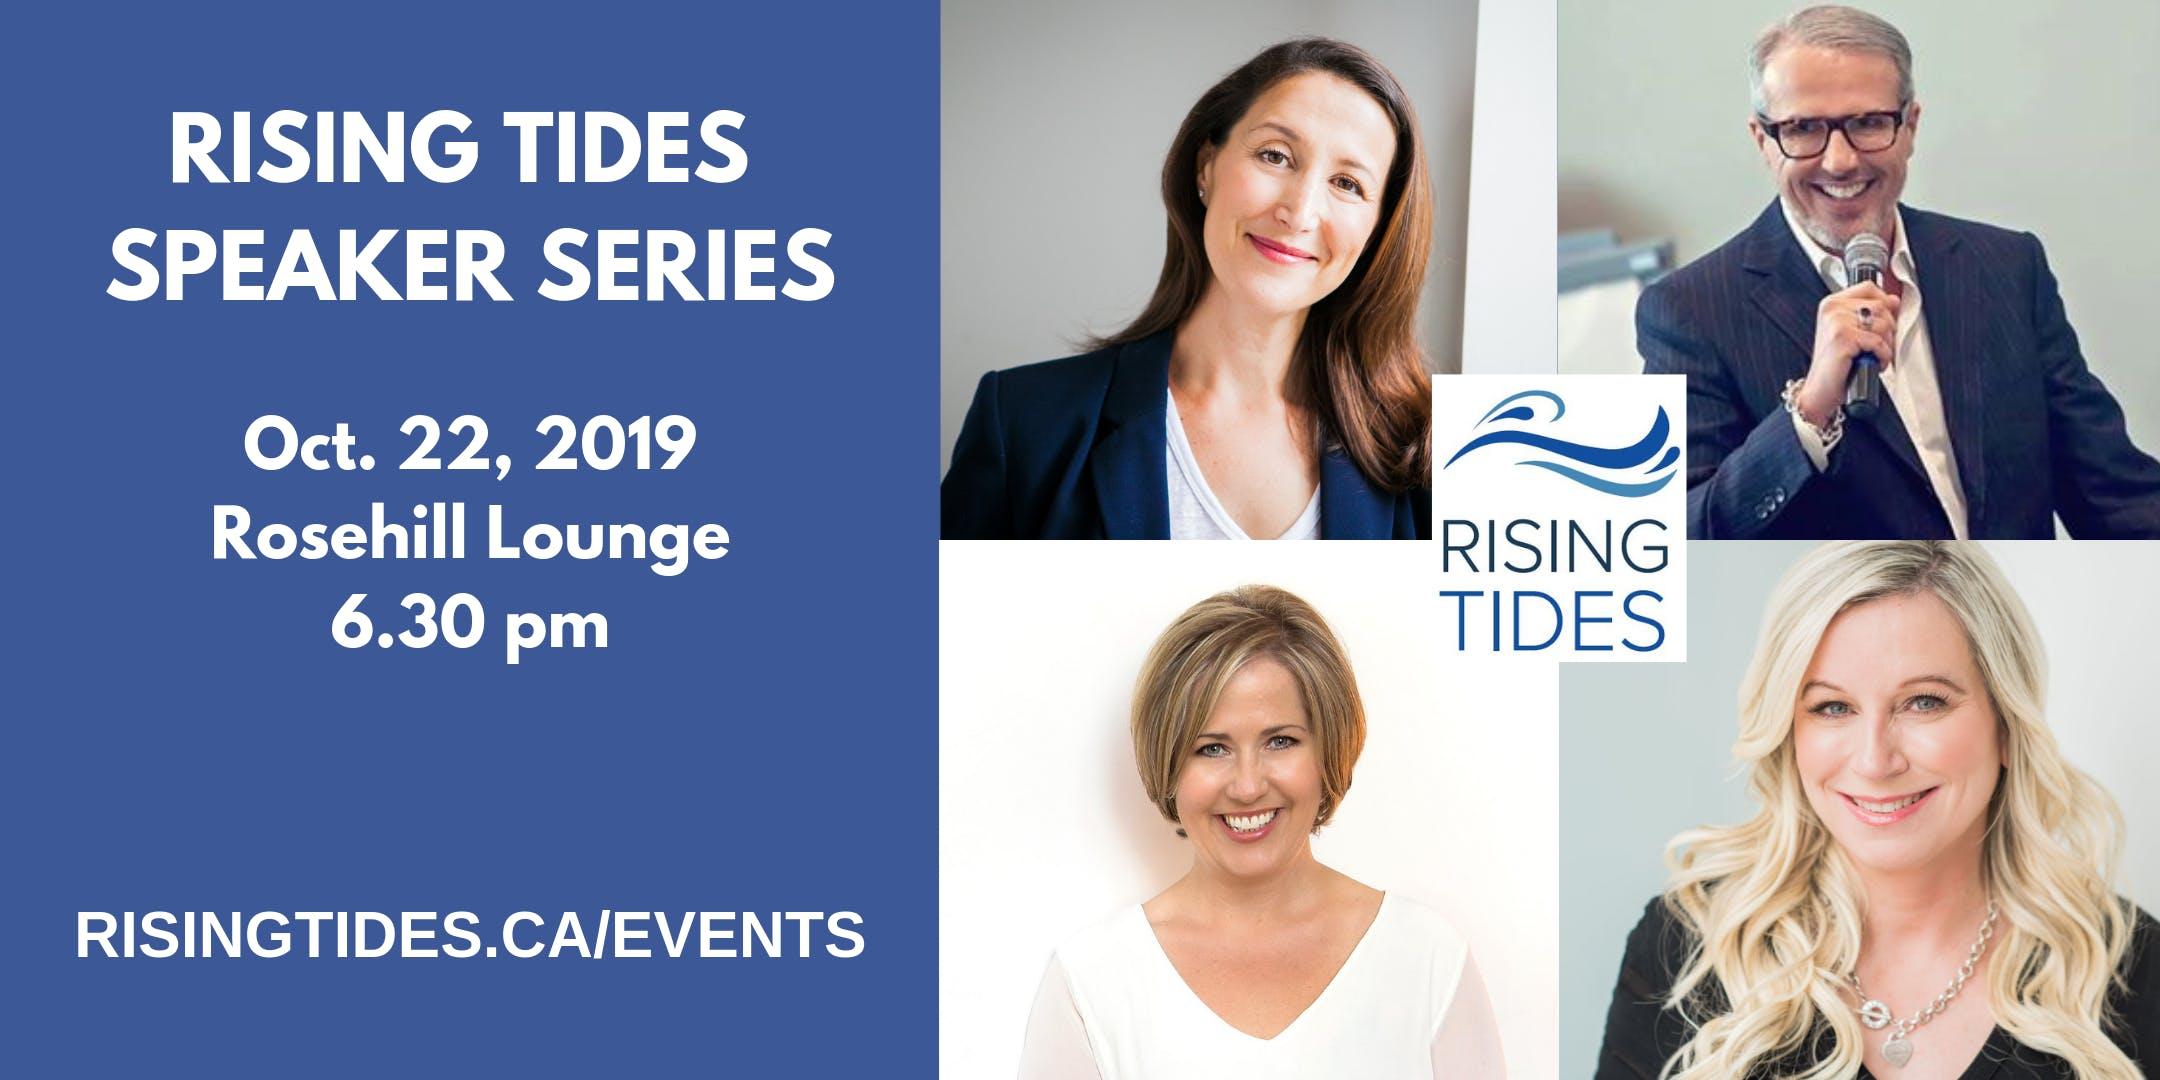 Rising Tides Speakers Series